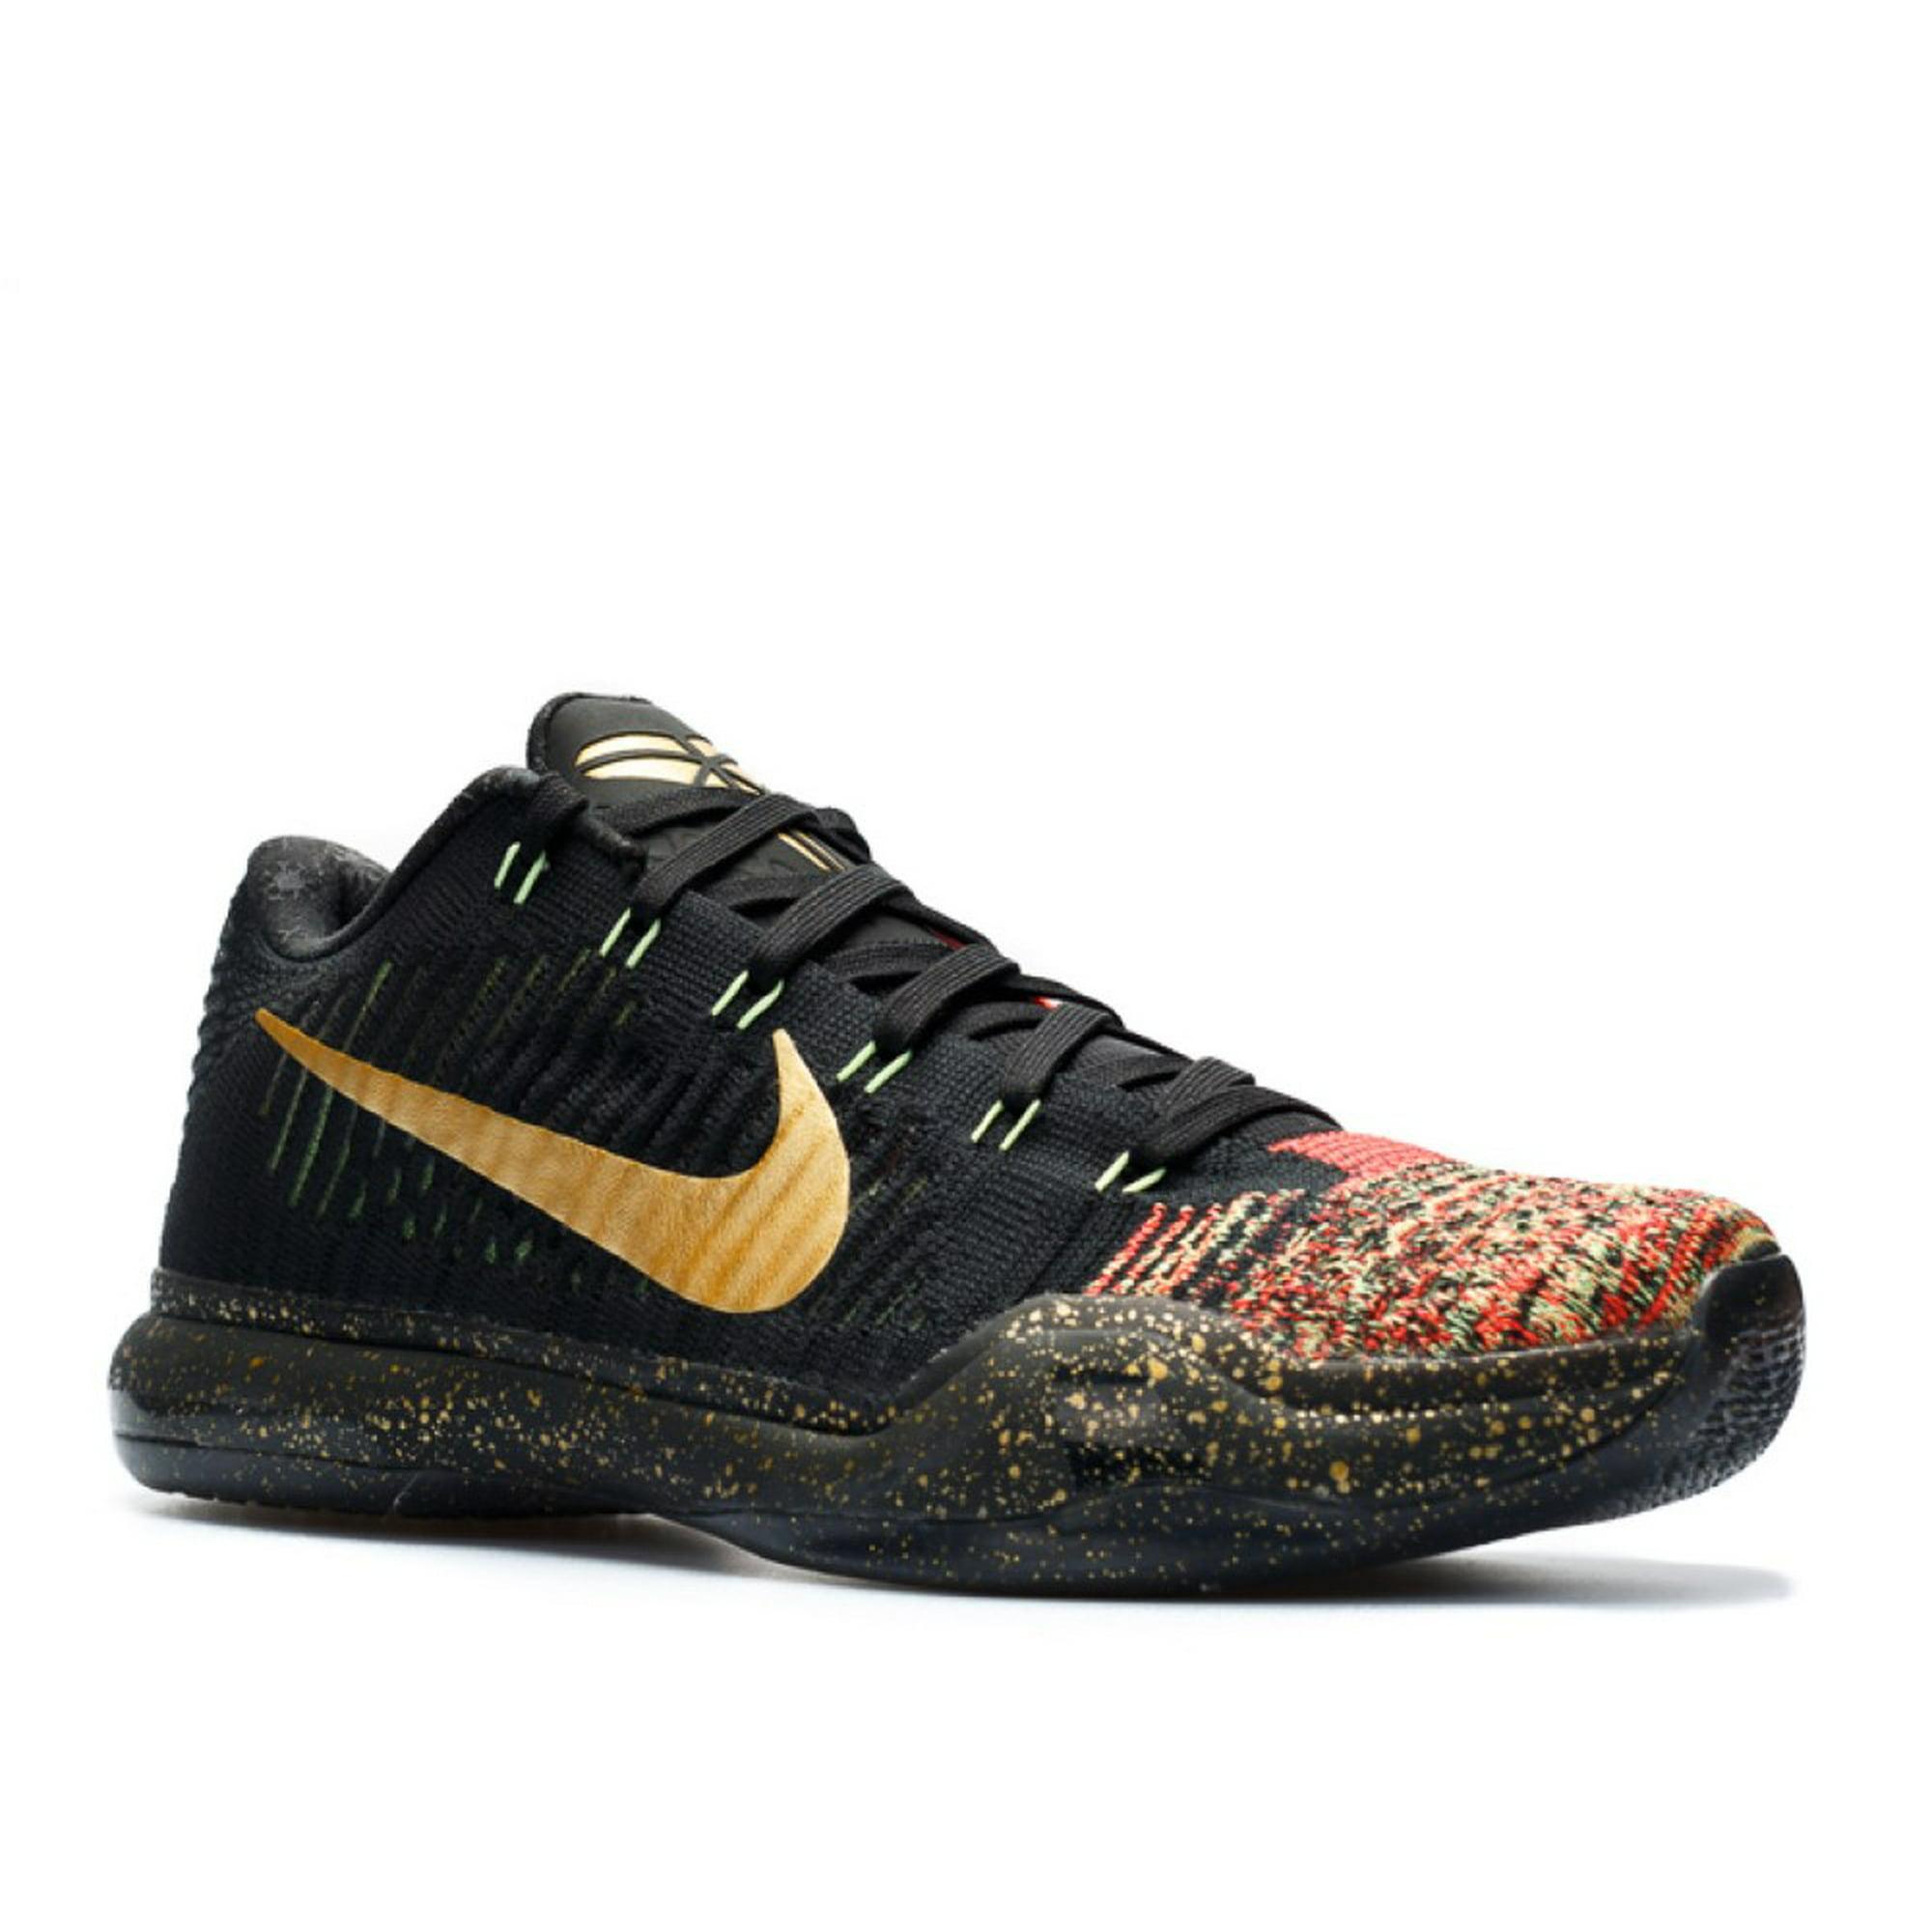 fbd0aab79345 Nike - Men - Kobe 10 Elite Low Xmas  Christmas  - 802560-076 - Size ...